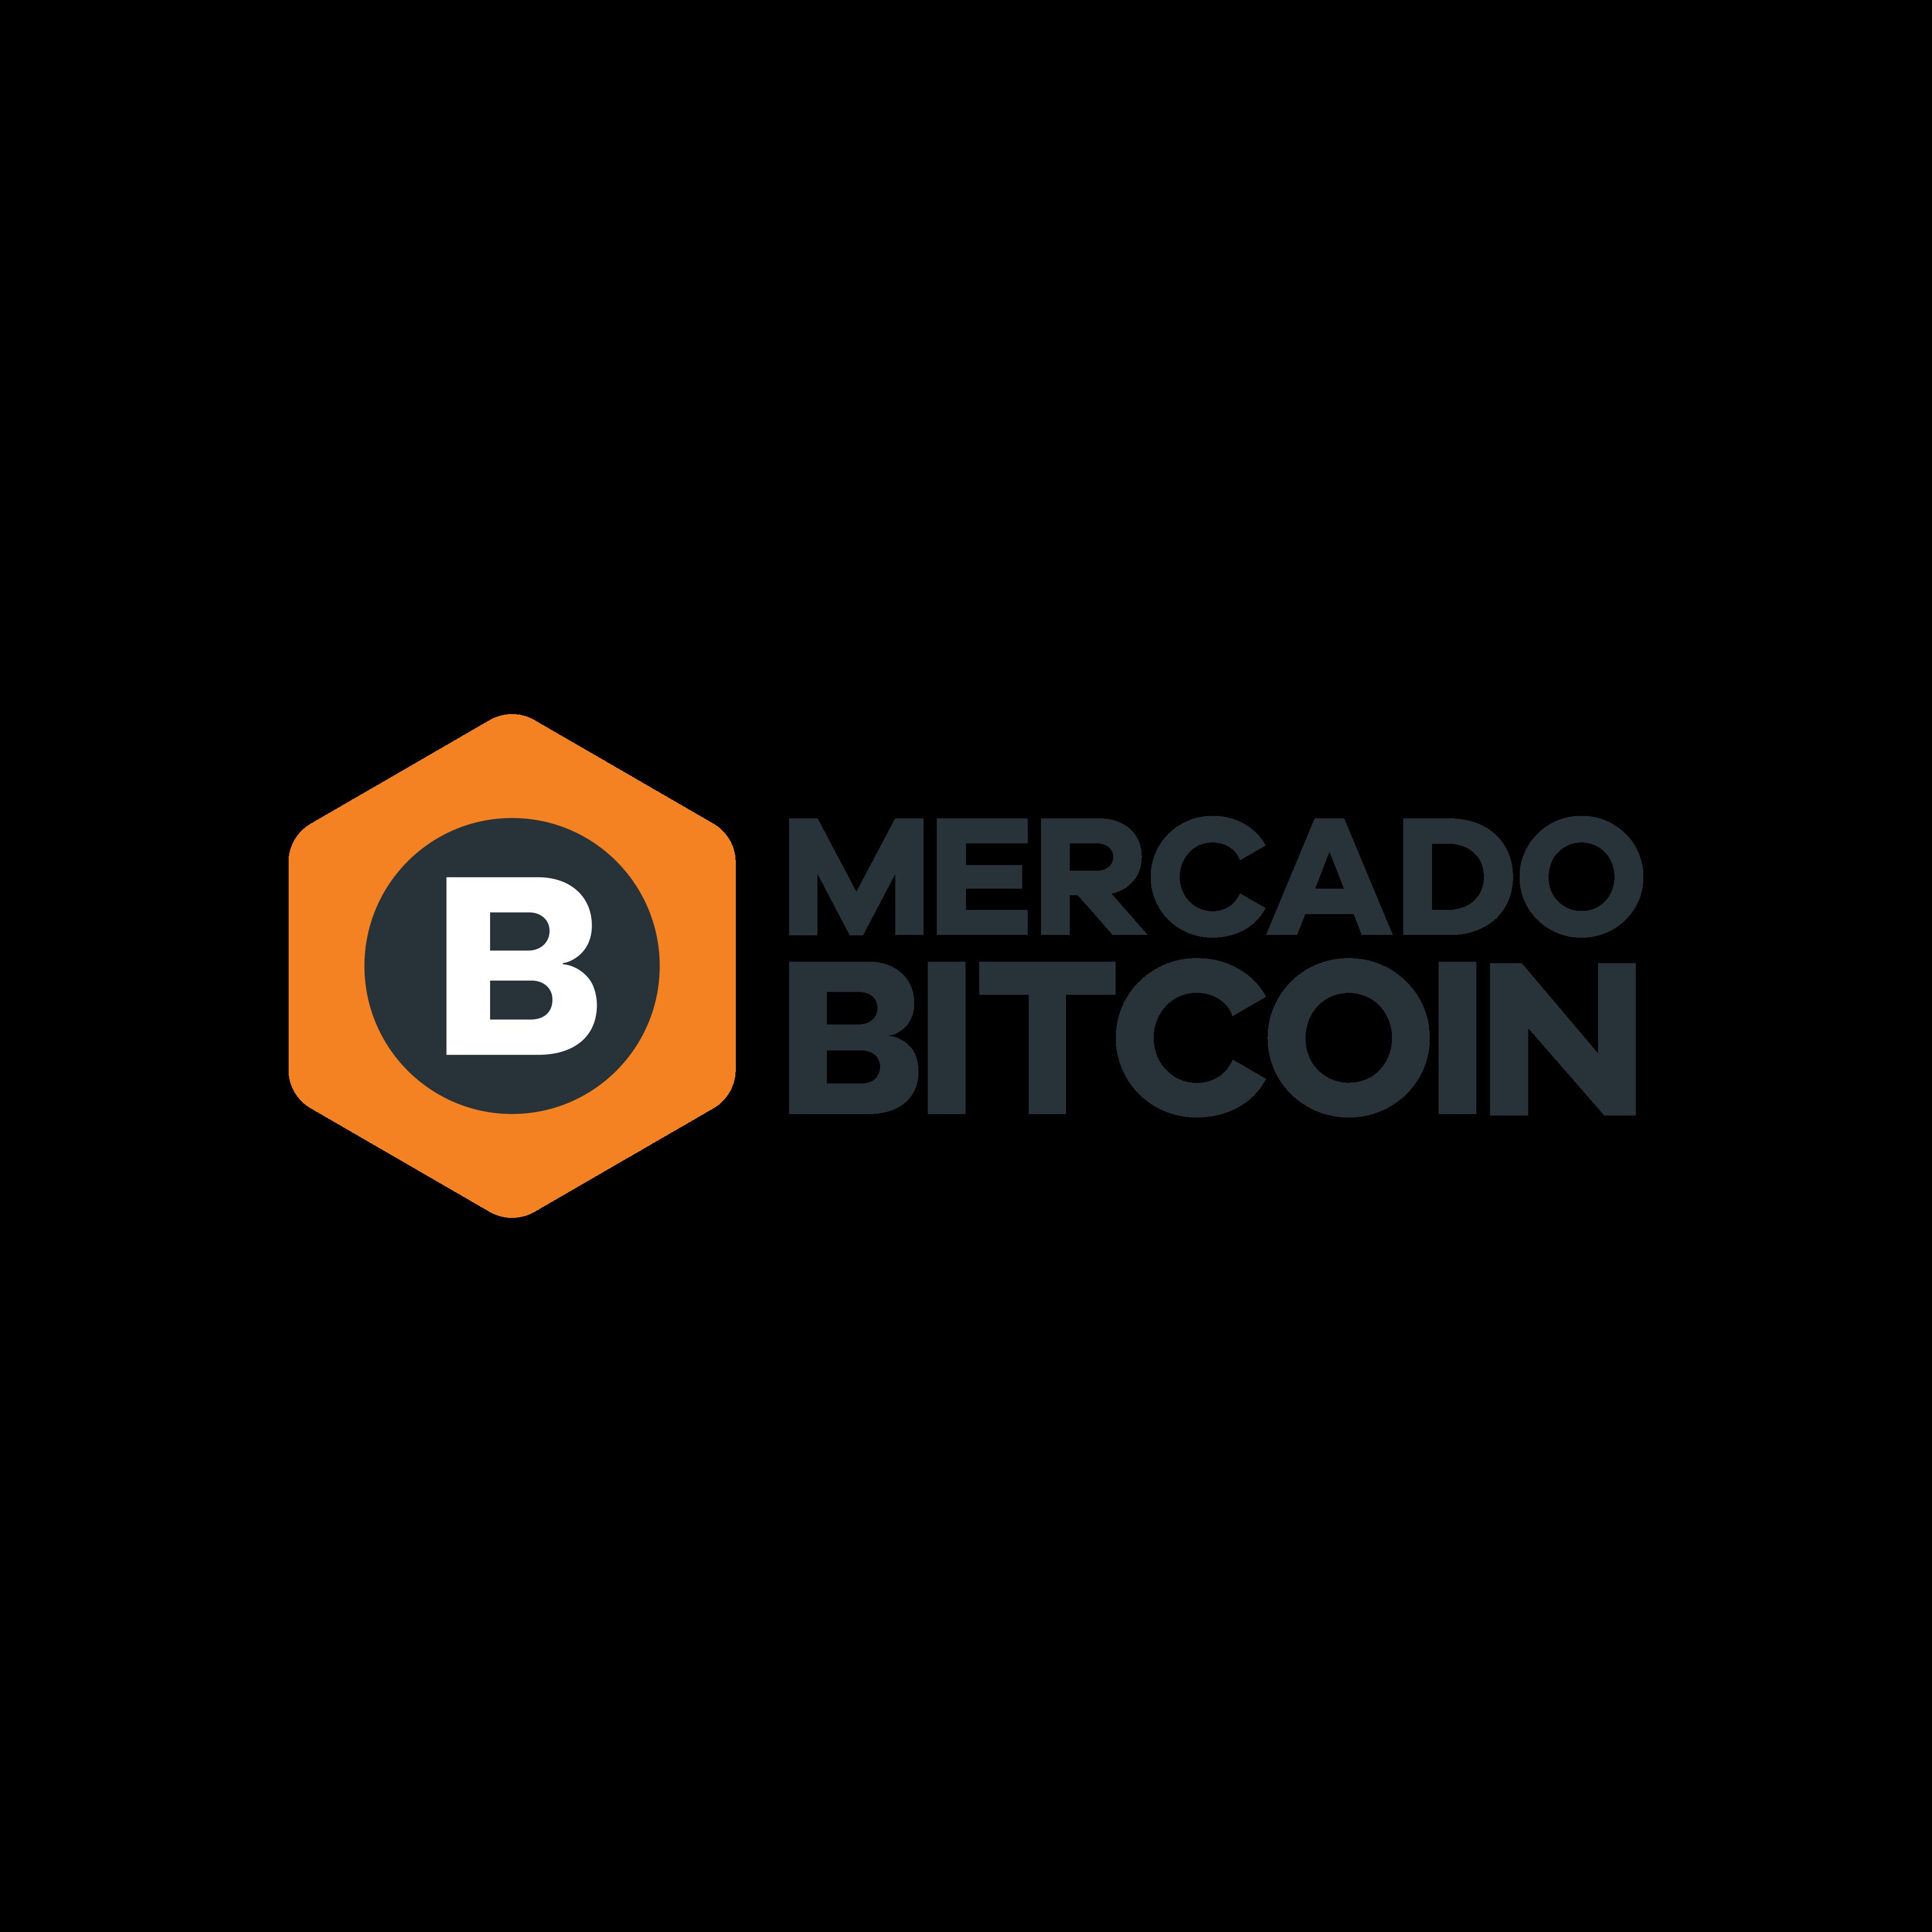 mercado bitcoin logo 0 - Mercado Bitcoin Logo